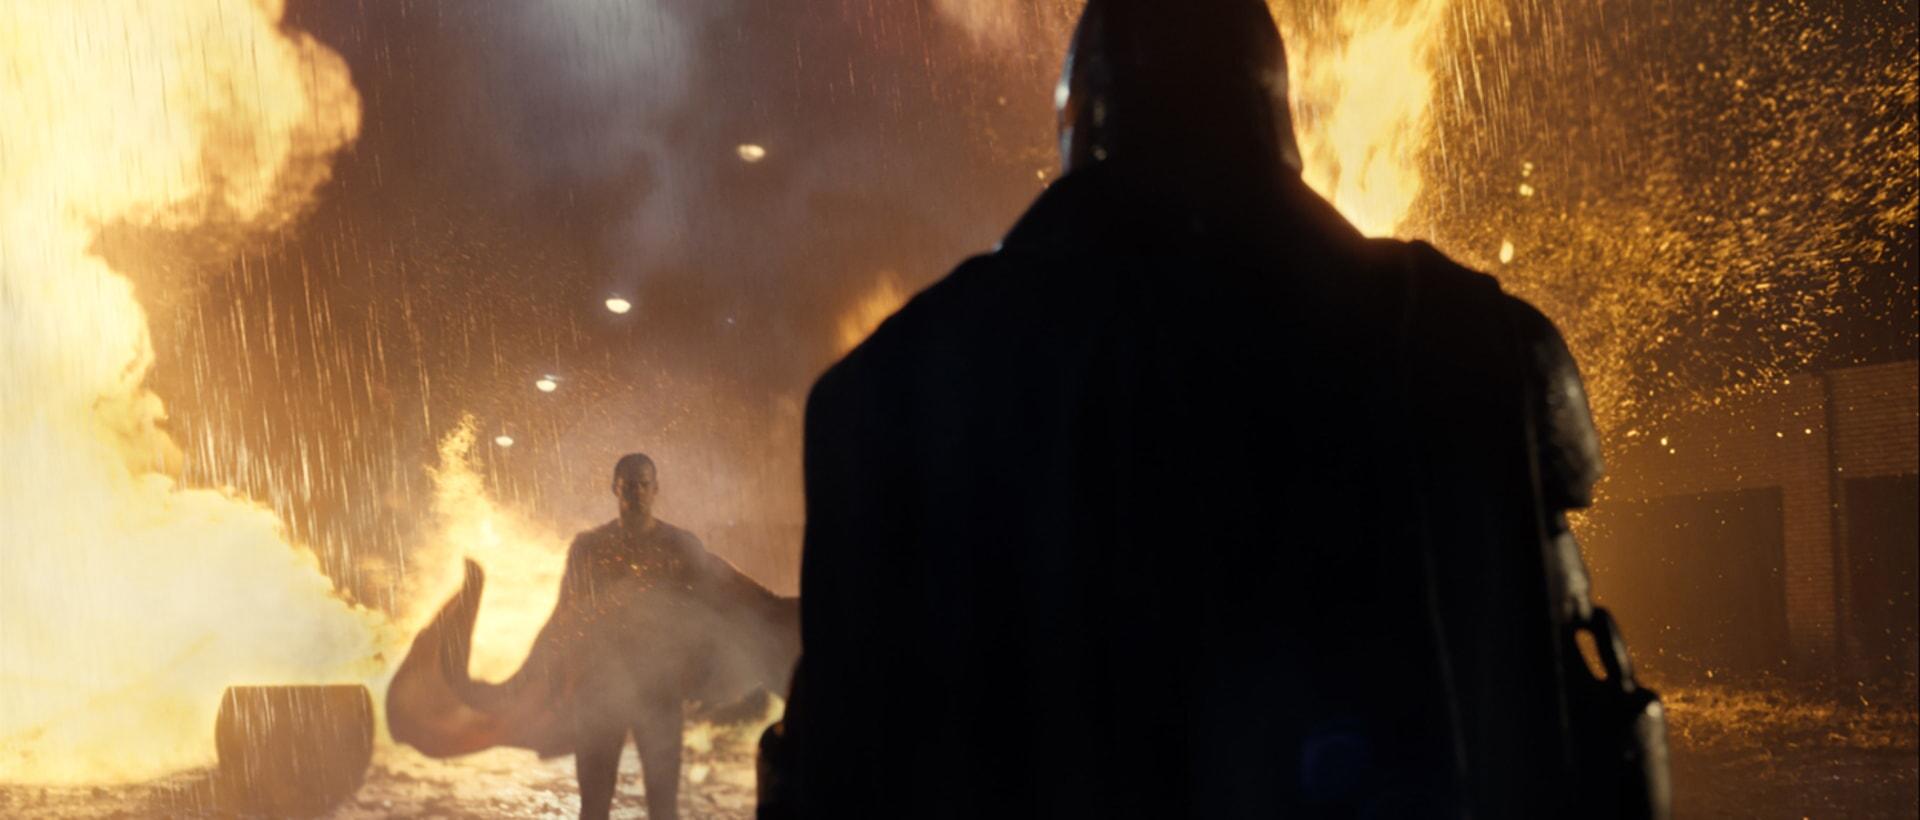 HENRY CAVILL as Superman and BEN AFFLECK as Batman